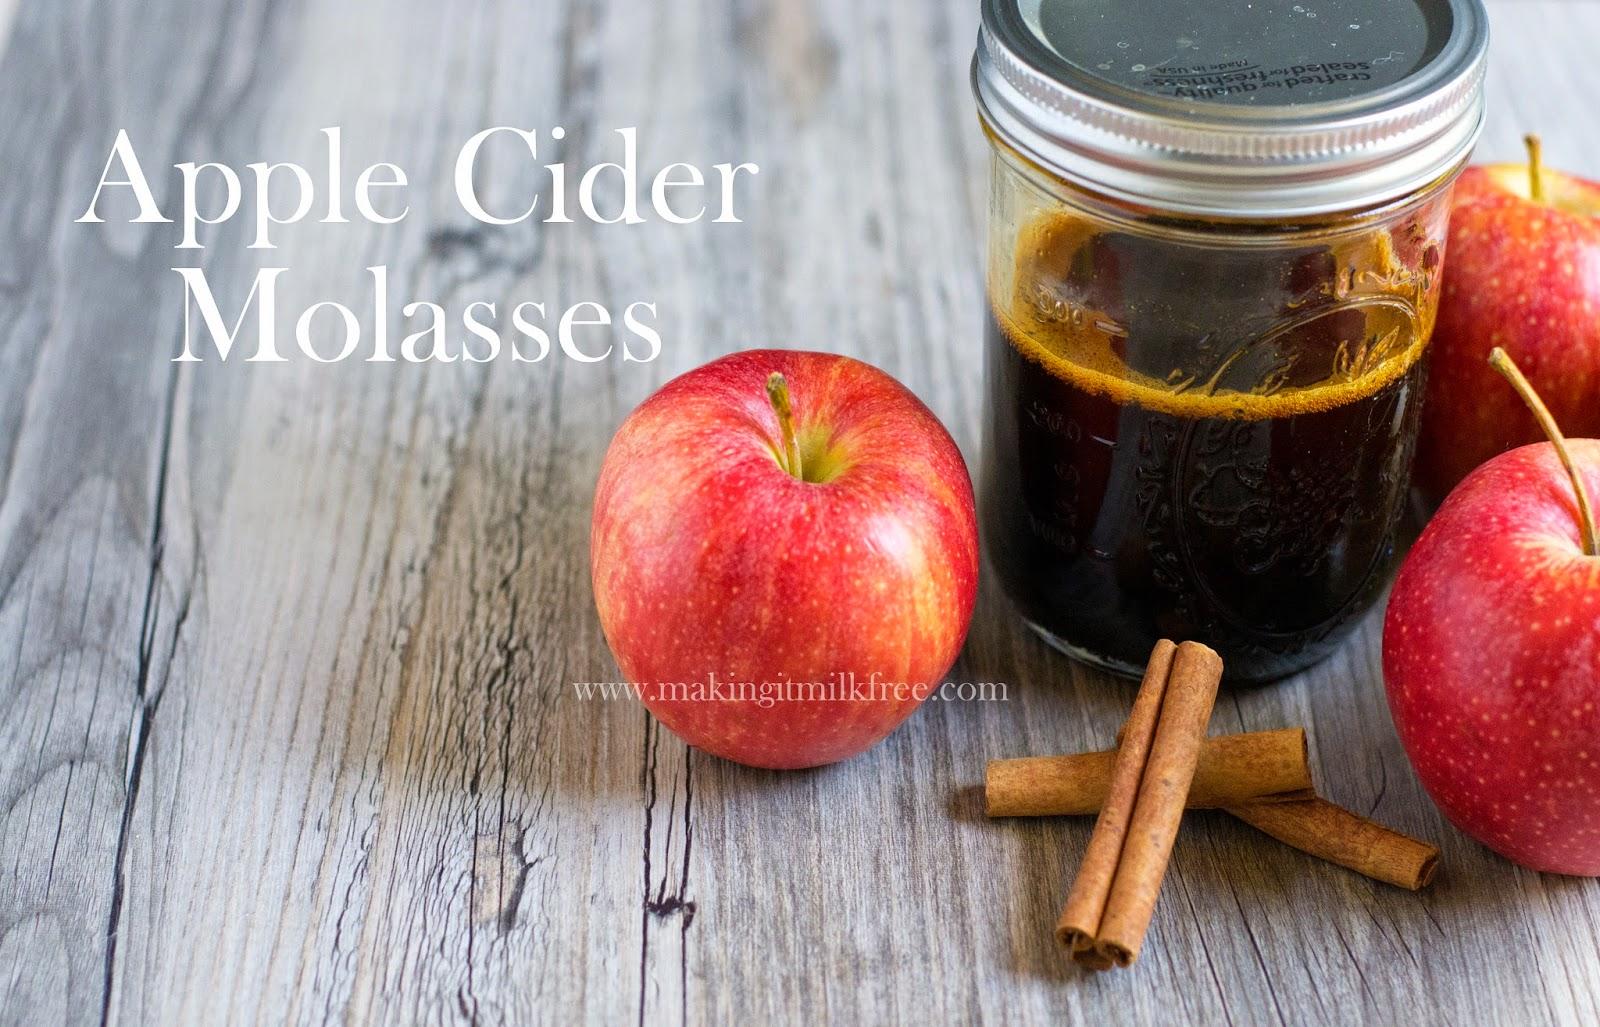 #apple #cider #molasses #fall